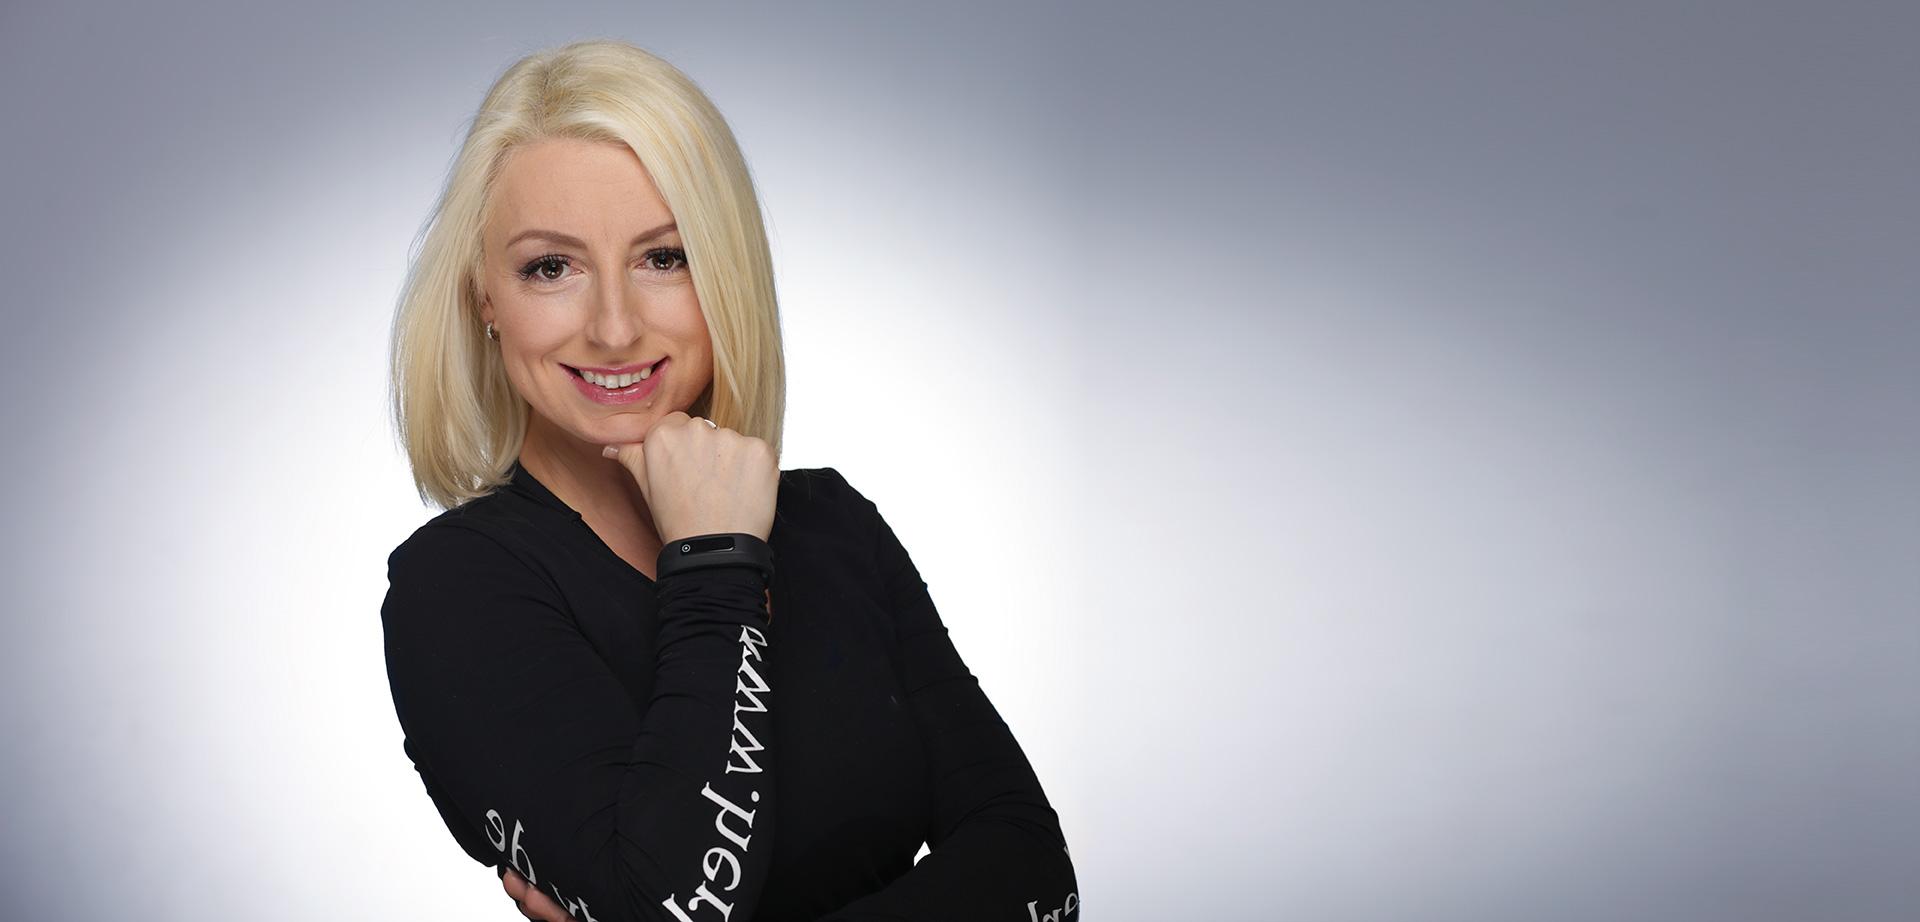 HerBody-Ksenia-Beckmann-Personal-Trainier-Frauen-2